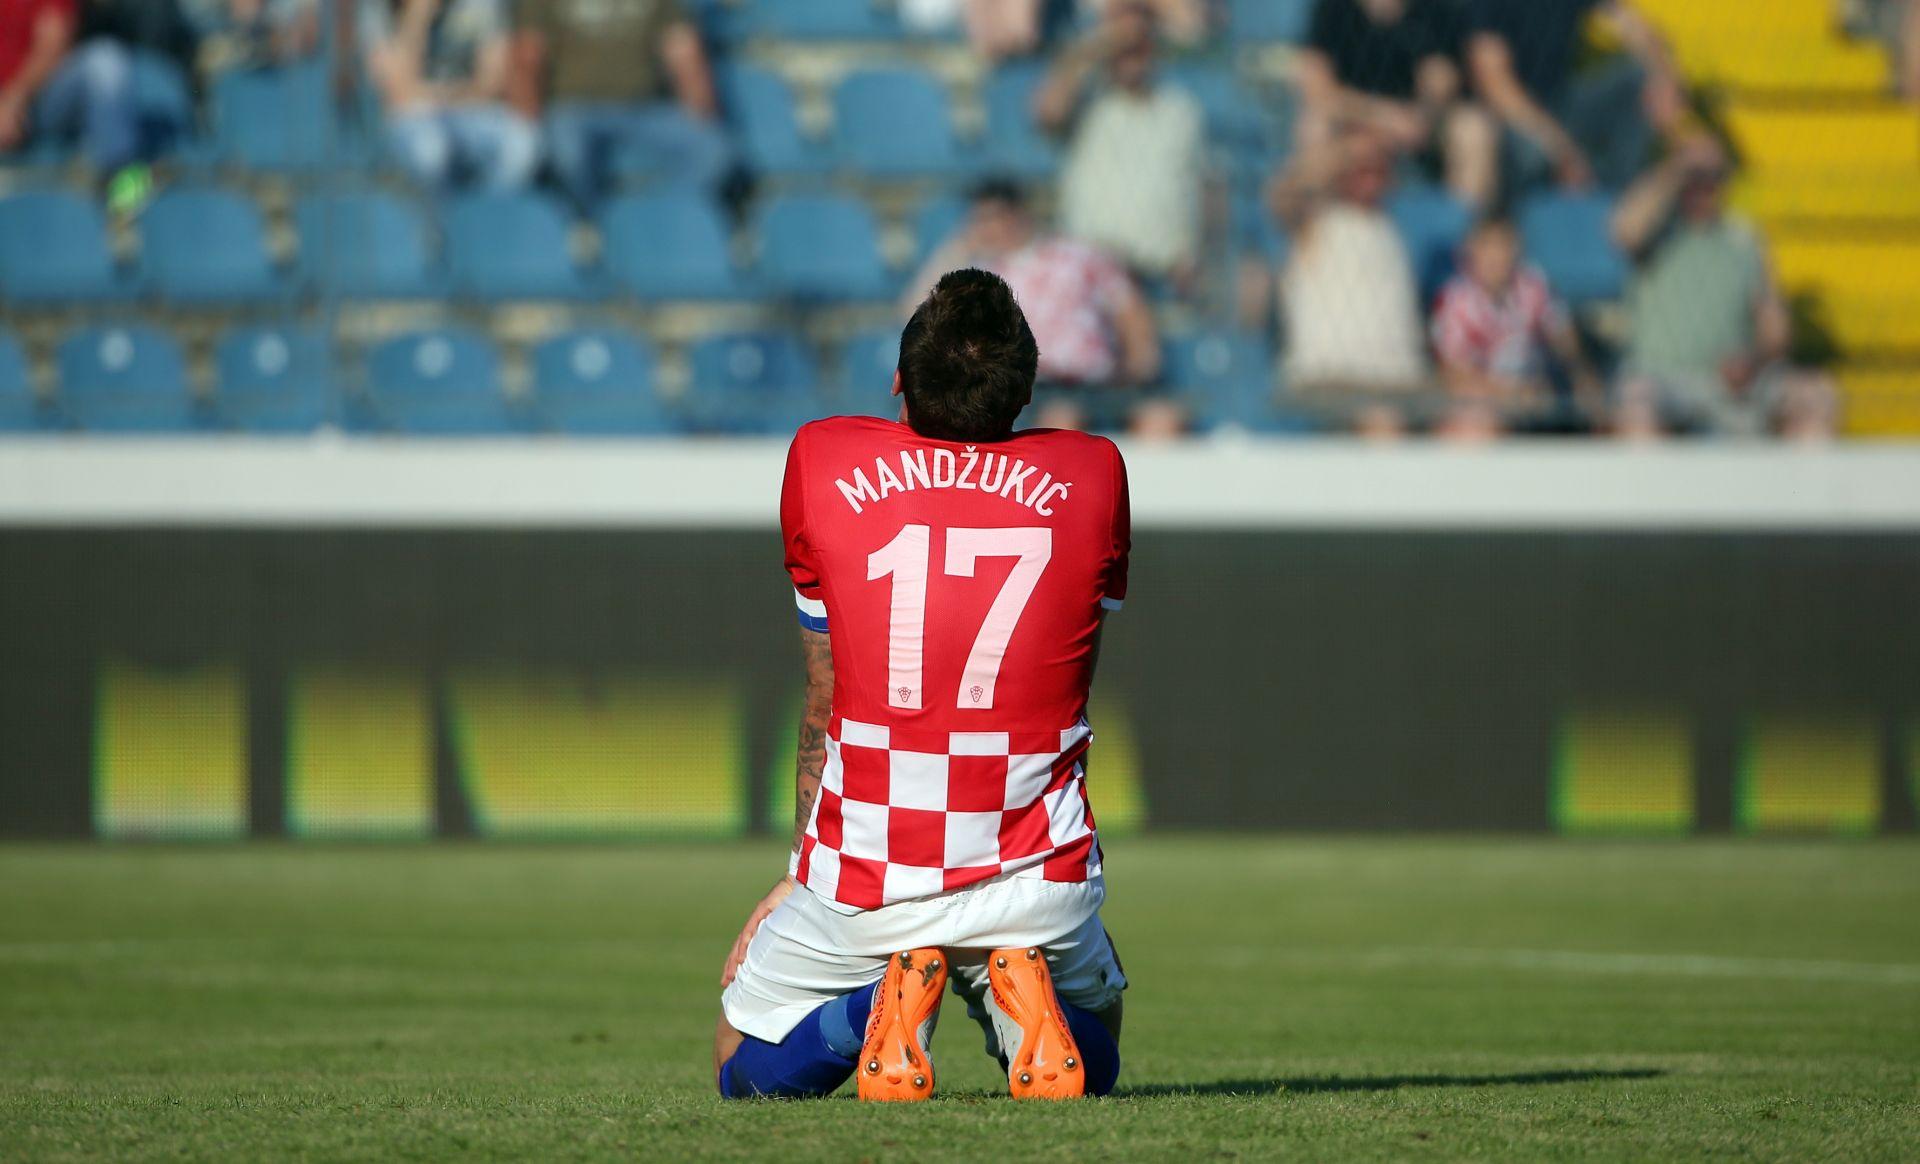 POTPISAN UGOVOR Mandžukić u Juventusu